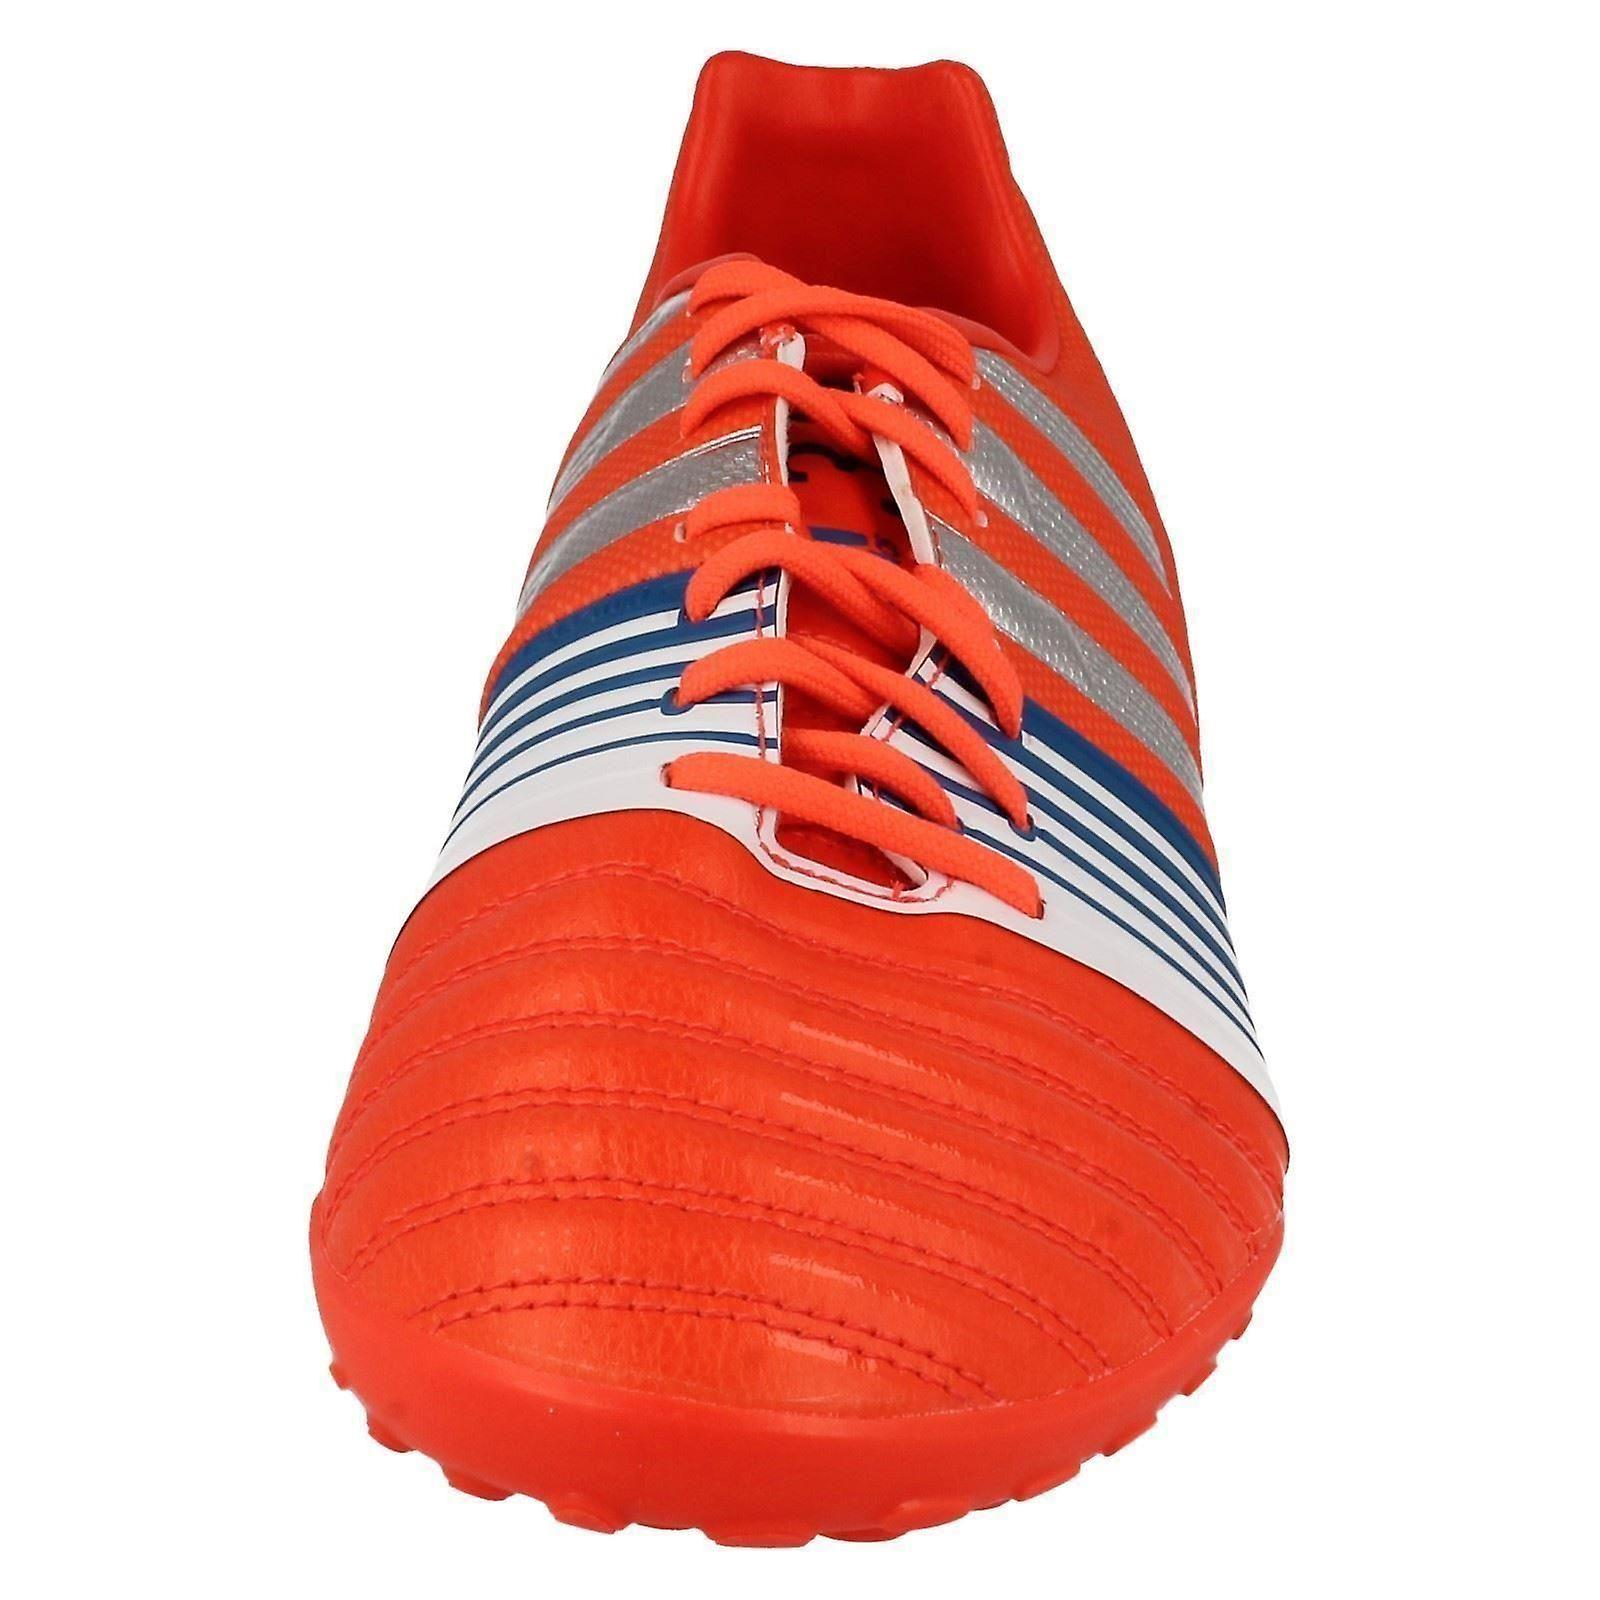 Heren Adidas voetbal Trainers Nitrocharge 3.0 TF kjrAdt